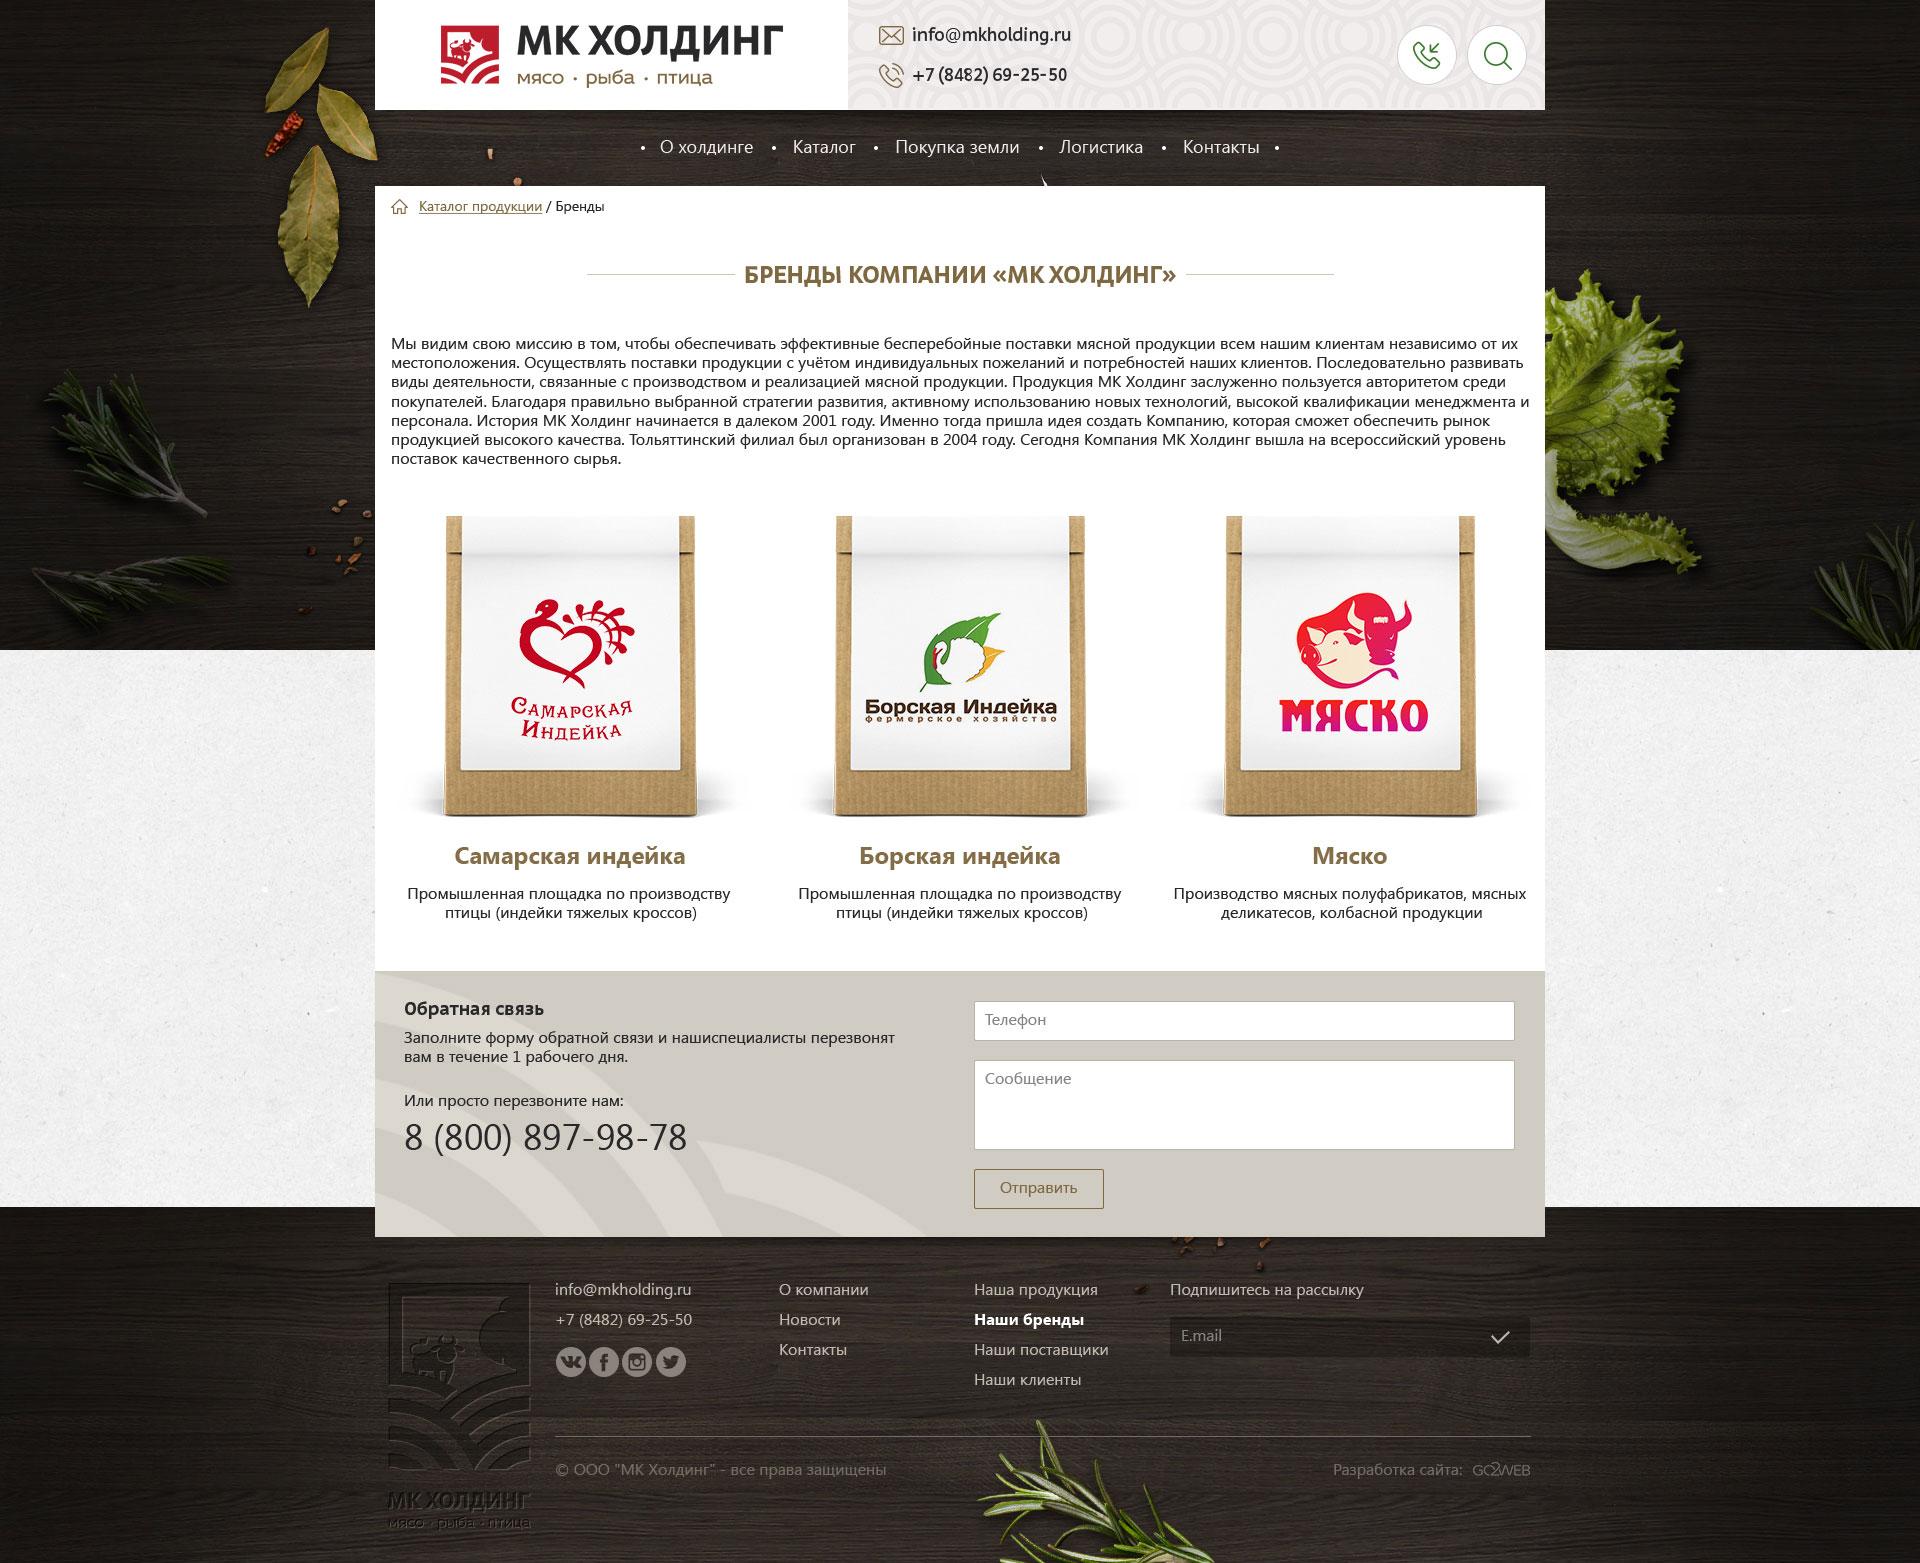 Внутренняя страница сайта МК Холдинг